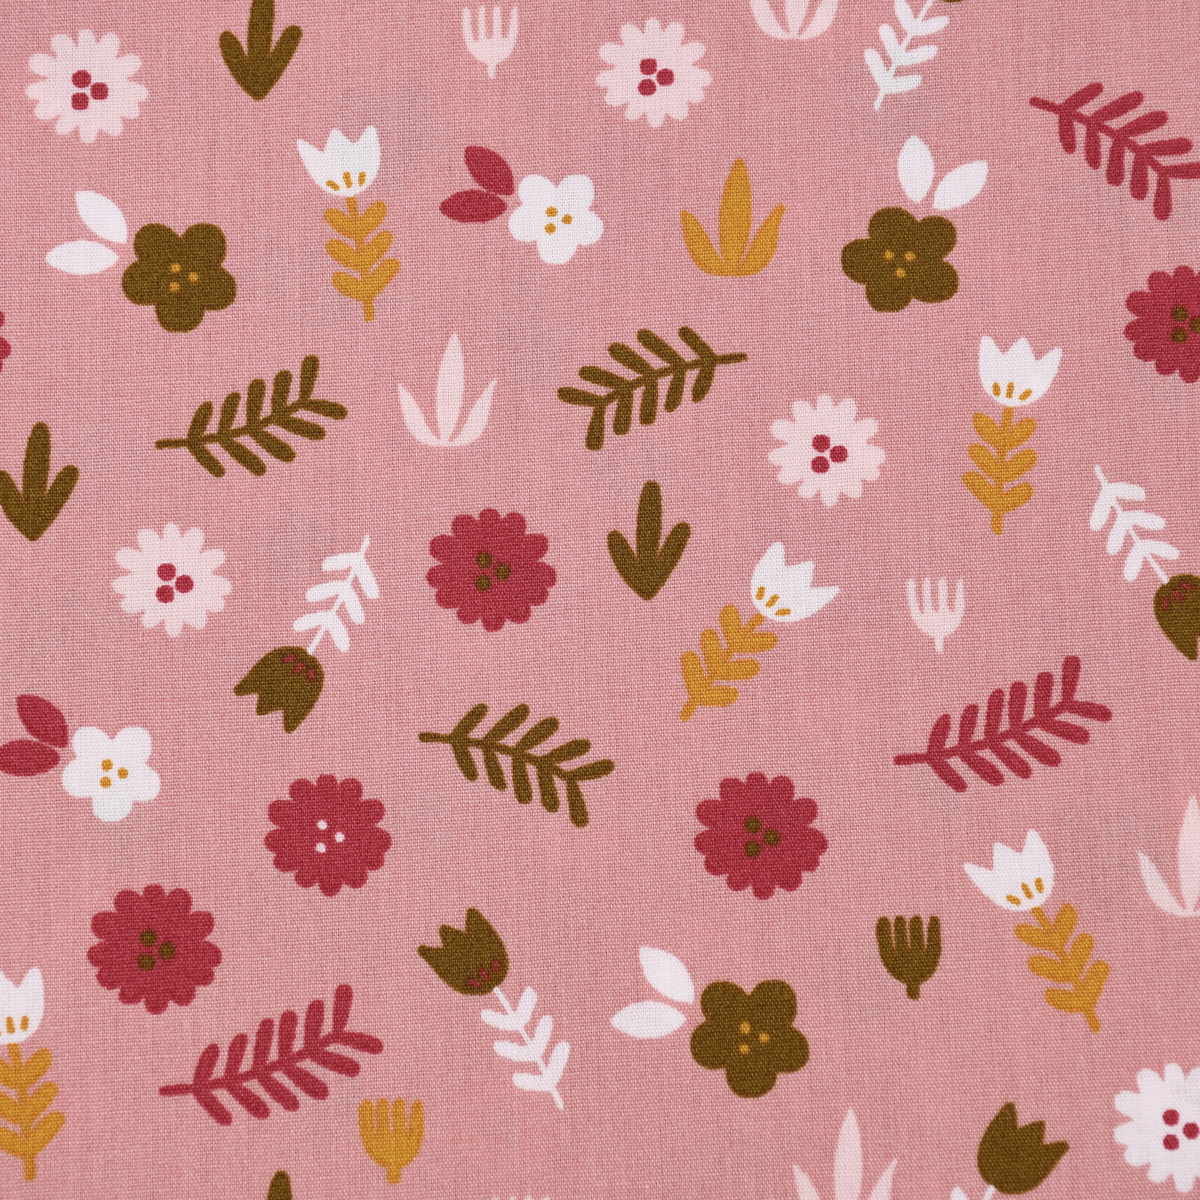 Baumwollstoff Popeline LOVELY STORY Blumen Blätter rosa pink ocker 1,45m Breite